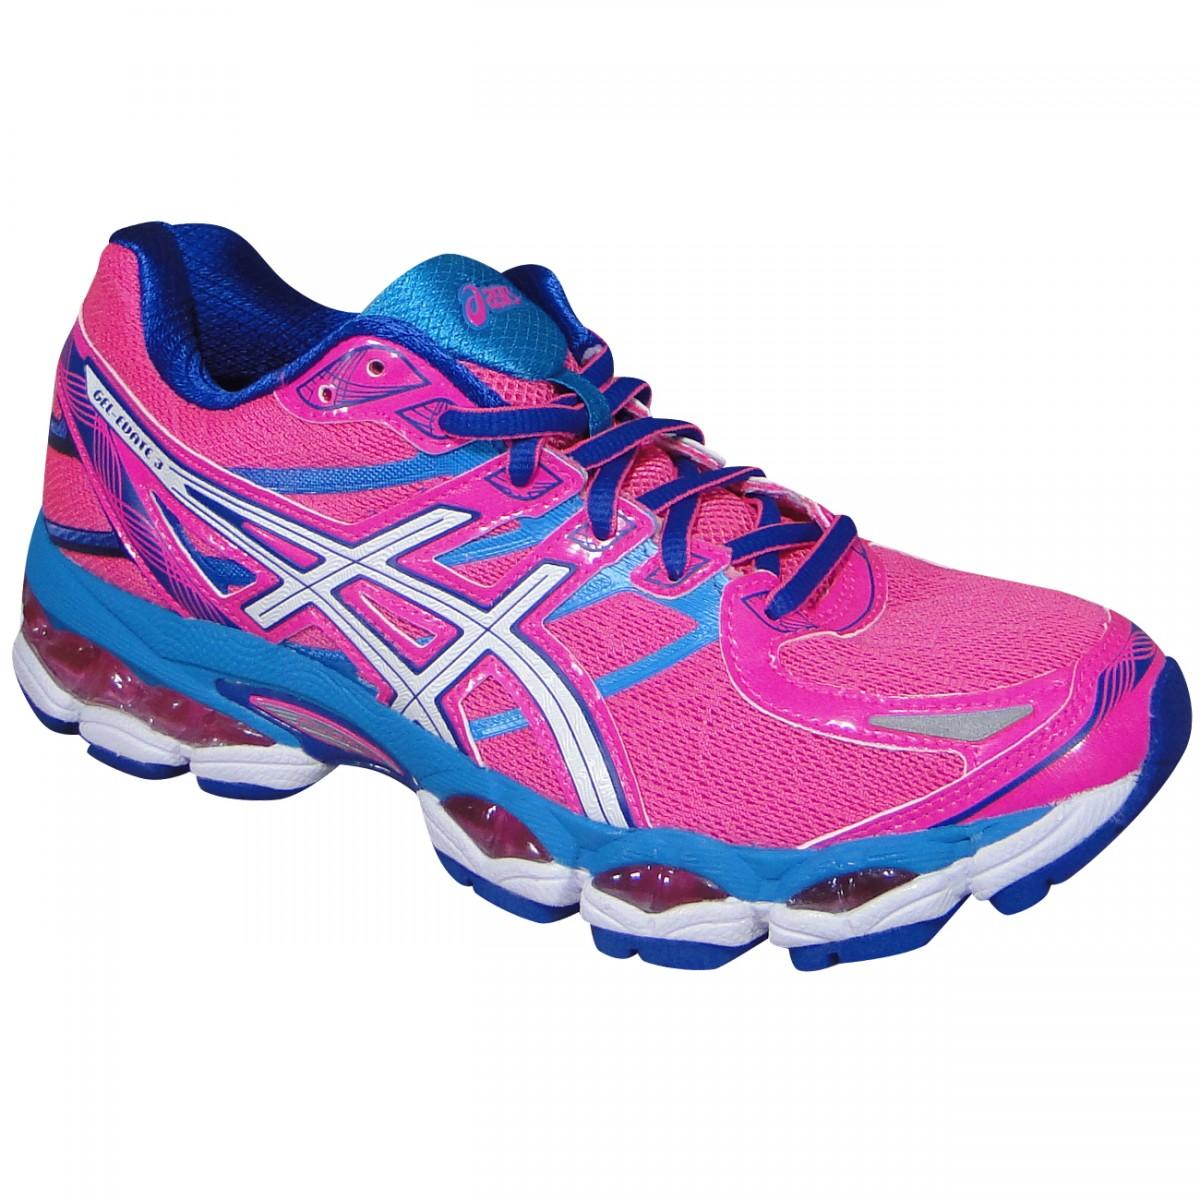 9d2e51fa68 Tenis Asics Gel-Evate 3 T566N 3401 - Pink/Azul/Branco - Chuteira Nike,  Adidas. Sandalias Femininas. Sandy Calçados